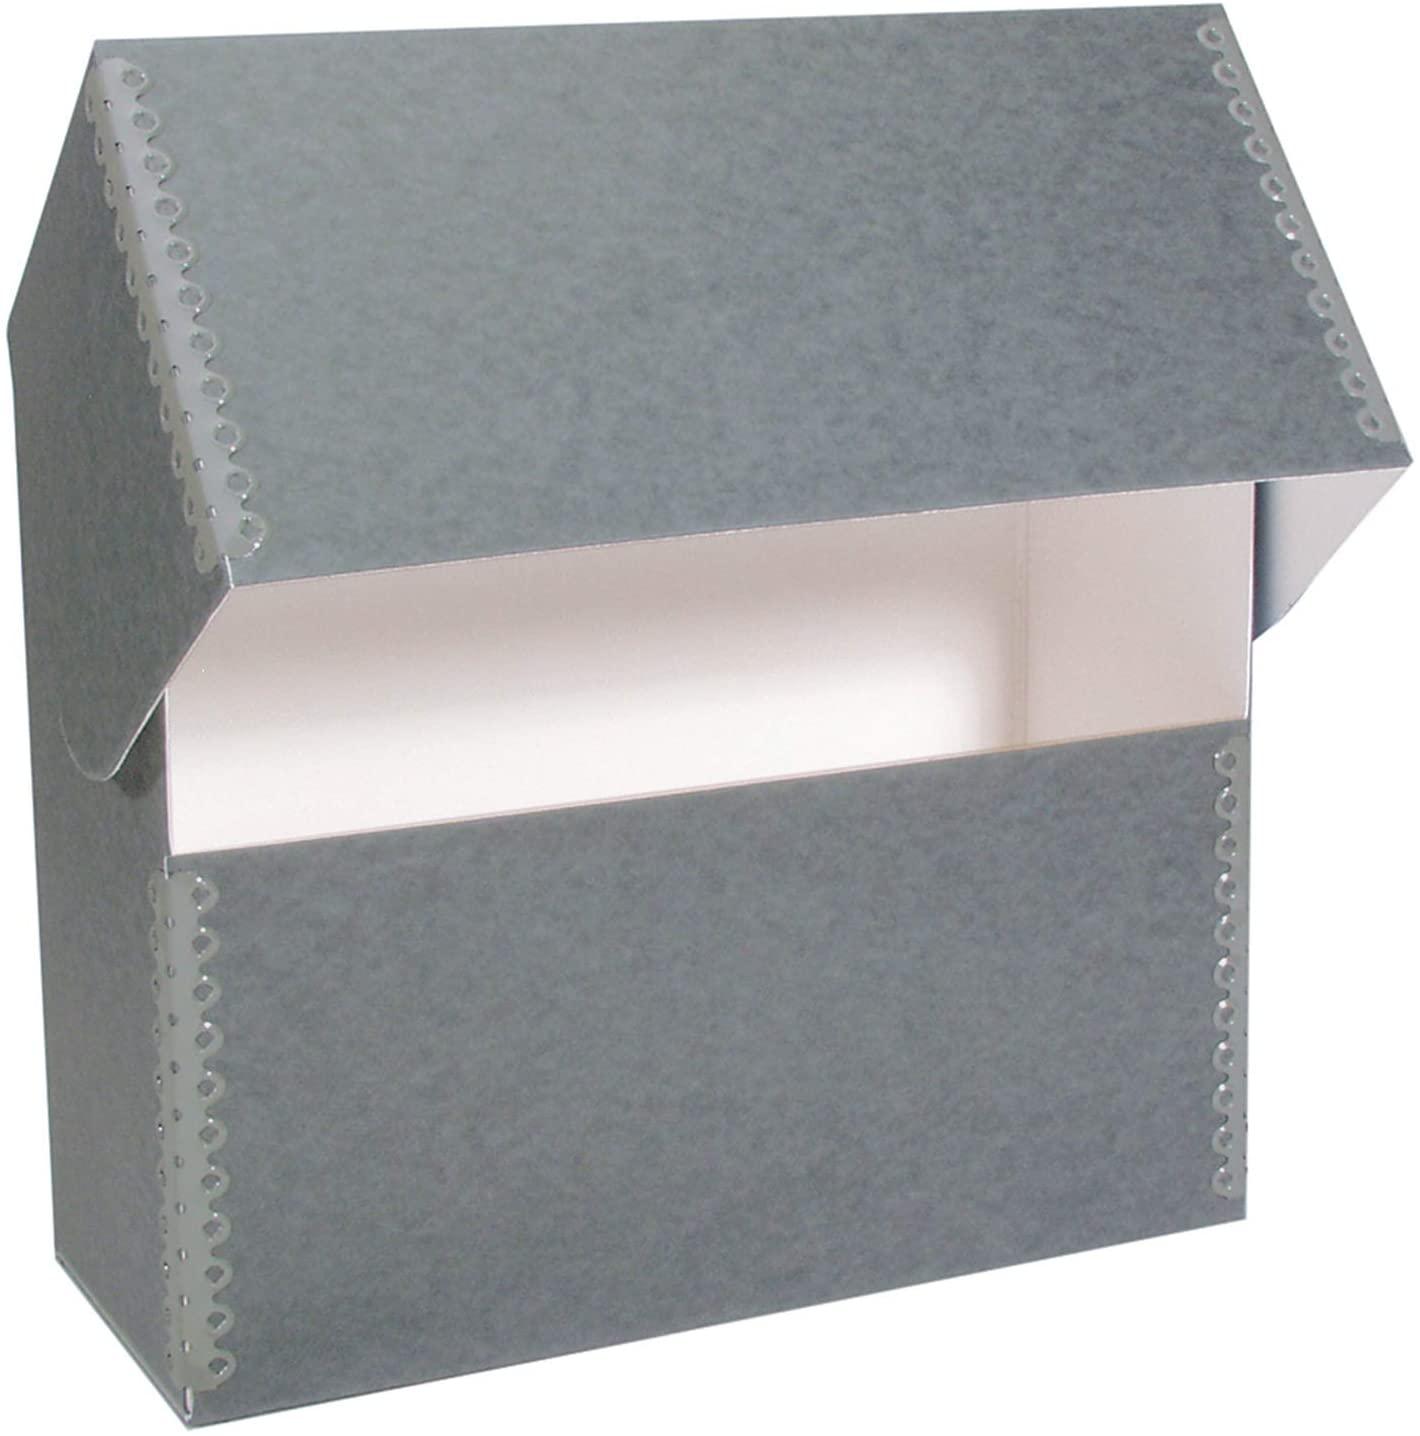 Lineco Document Case, Legal Blue Gray 15.25 x 10.25 x 2.5